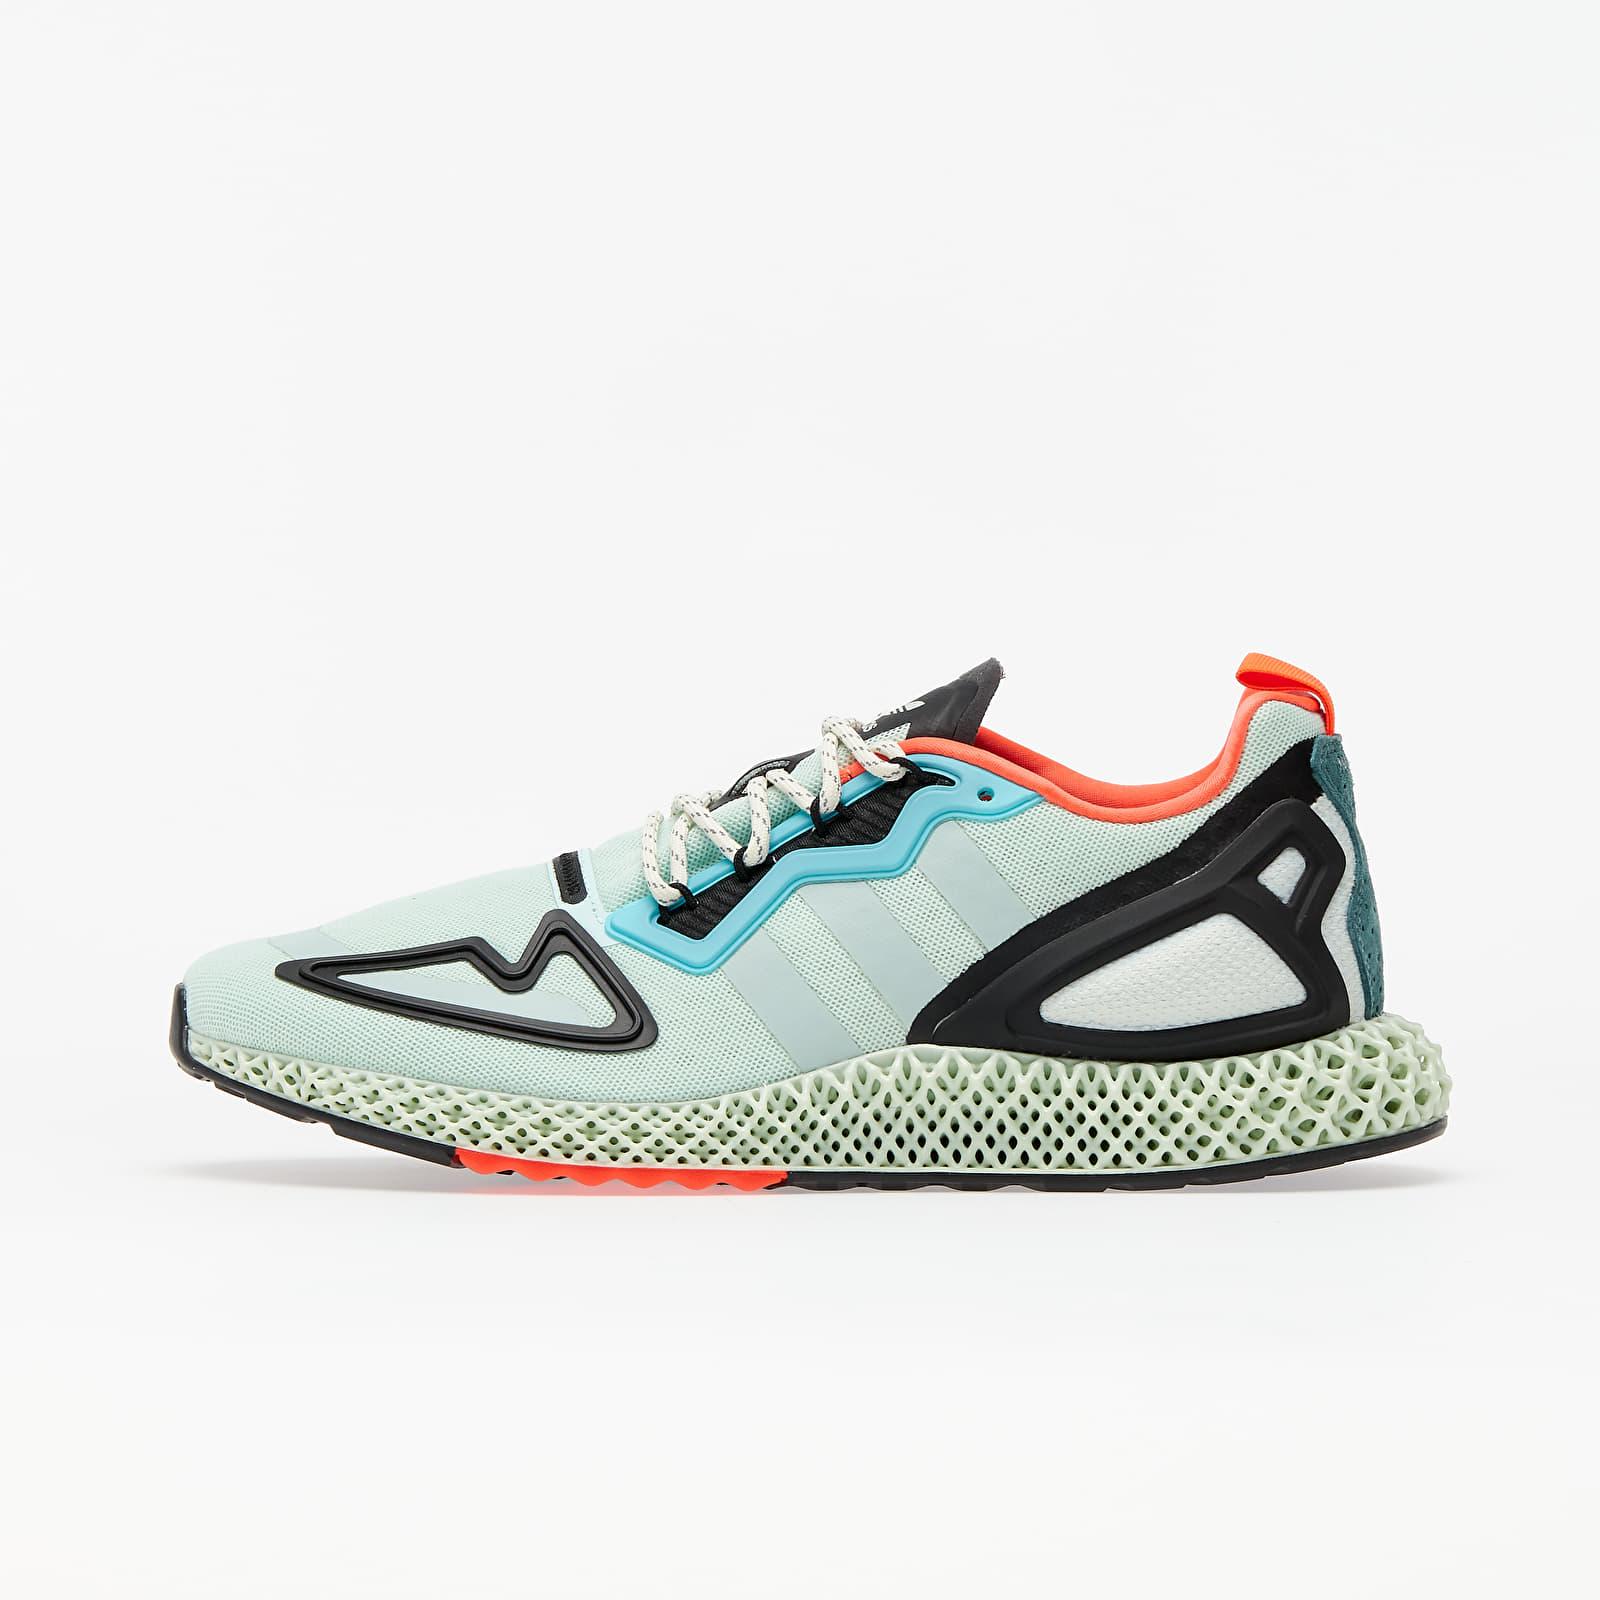 Pánske tenisky a topánky adidas ZX 2K 4D Dash Green/ Green Tint/ Raw Green